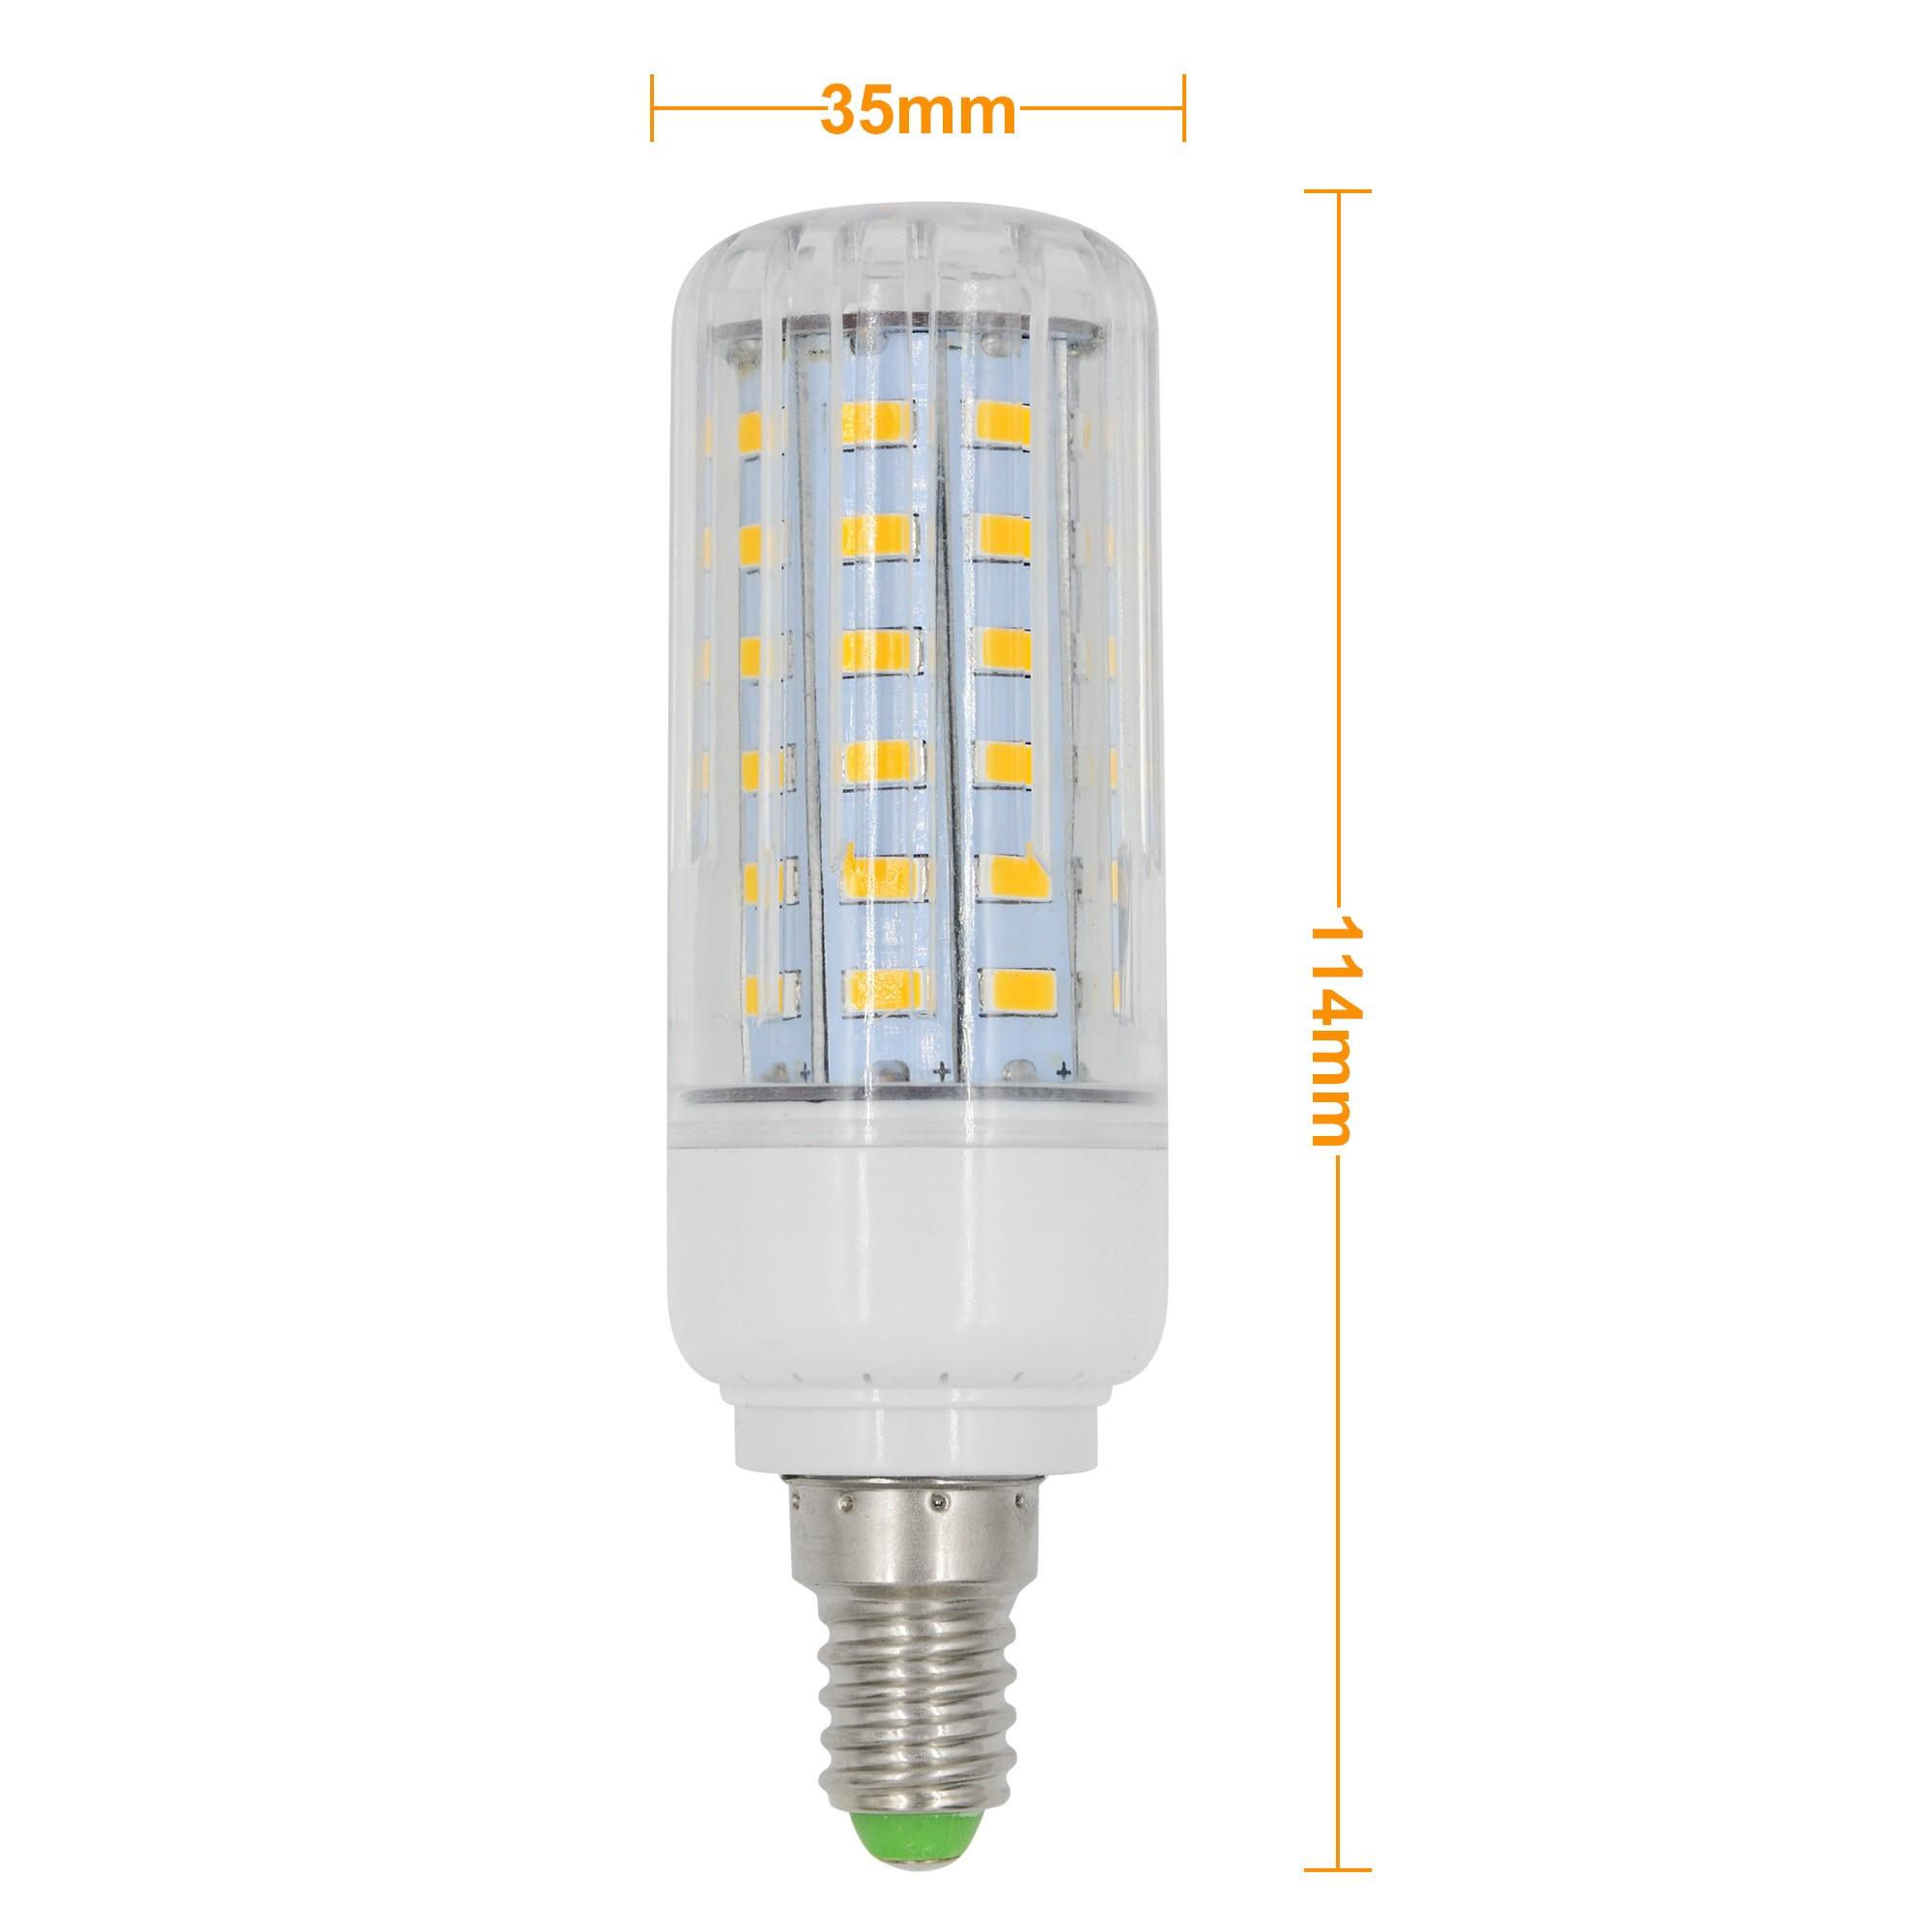 mengsled mengs e14 9w led dimmable corn light 60x 5736 smd led bulb lamp ac 220 240v in warm. Black Bedroom Furniture Sets. Home Design Ideas